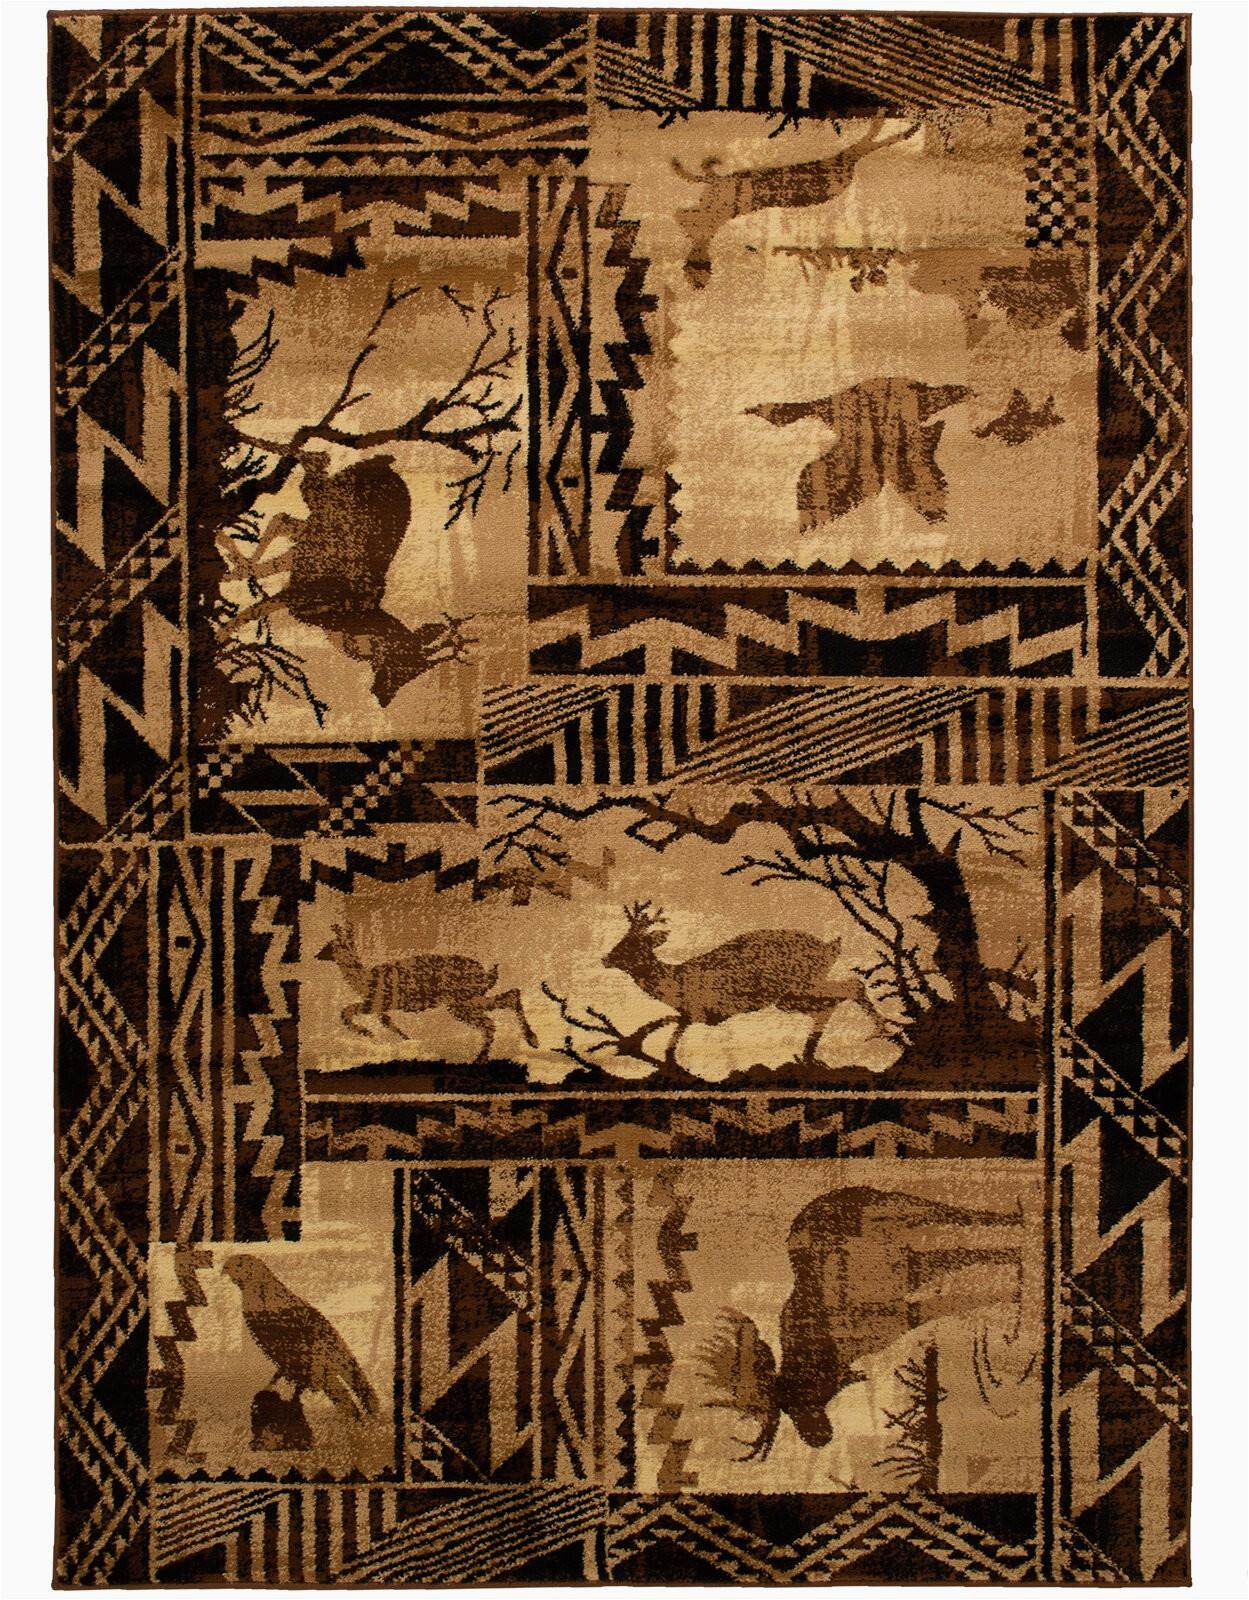 allport high quality woven ultra soft southwest wilderness theme berber area rug